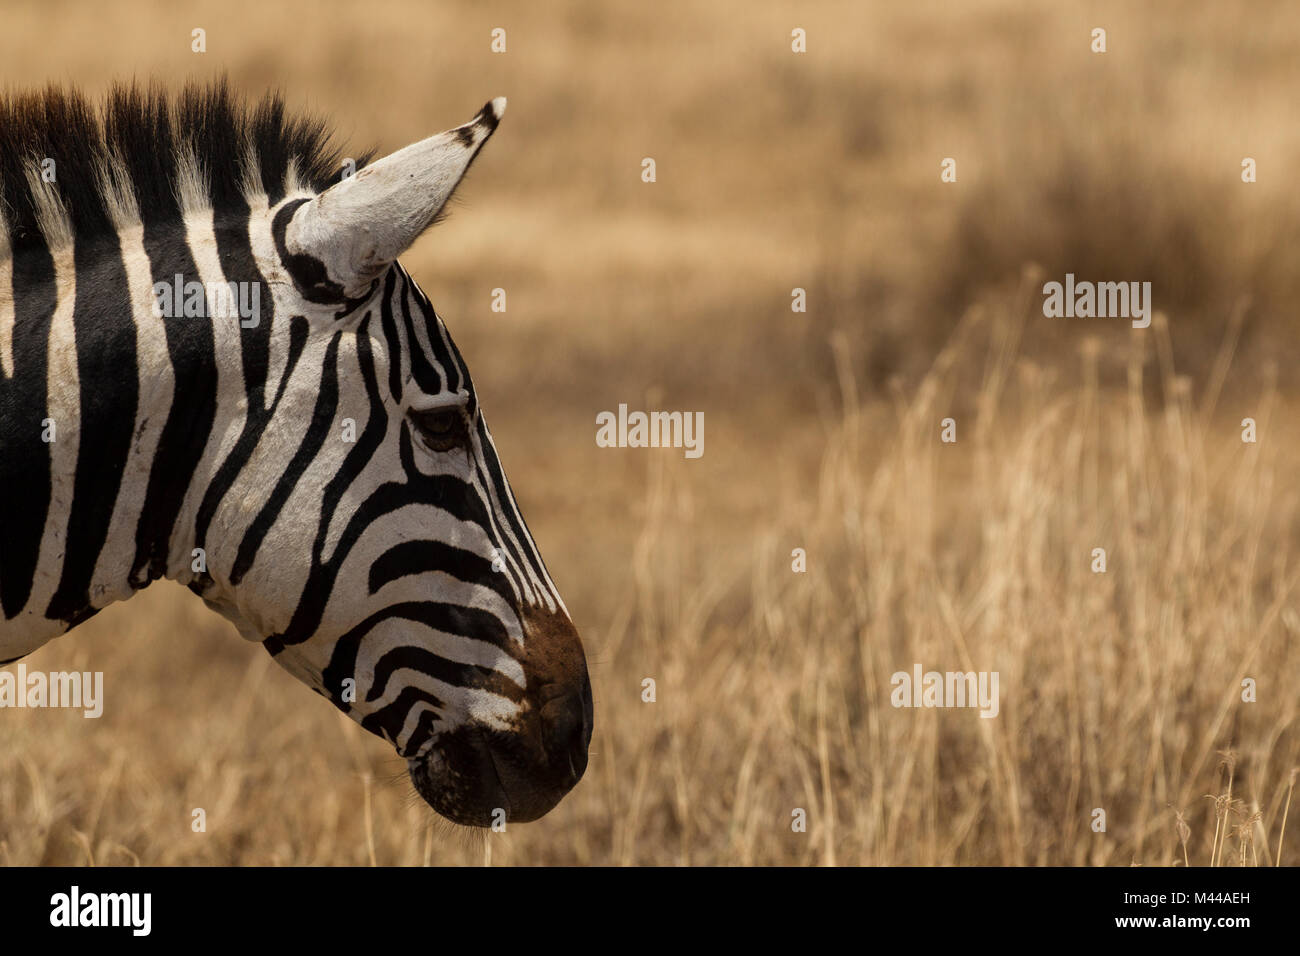 Zebra, Equus burchelli, Serengeti National Park, Tanzania - Stock Image